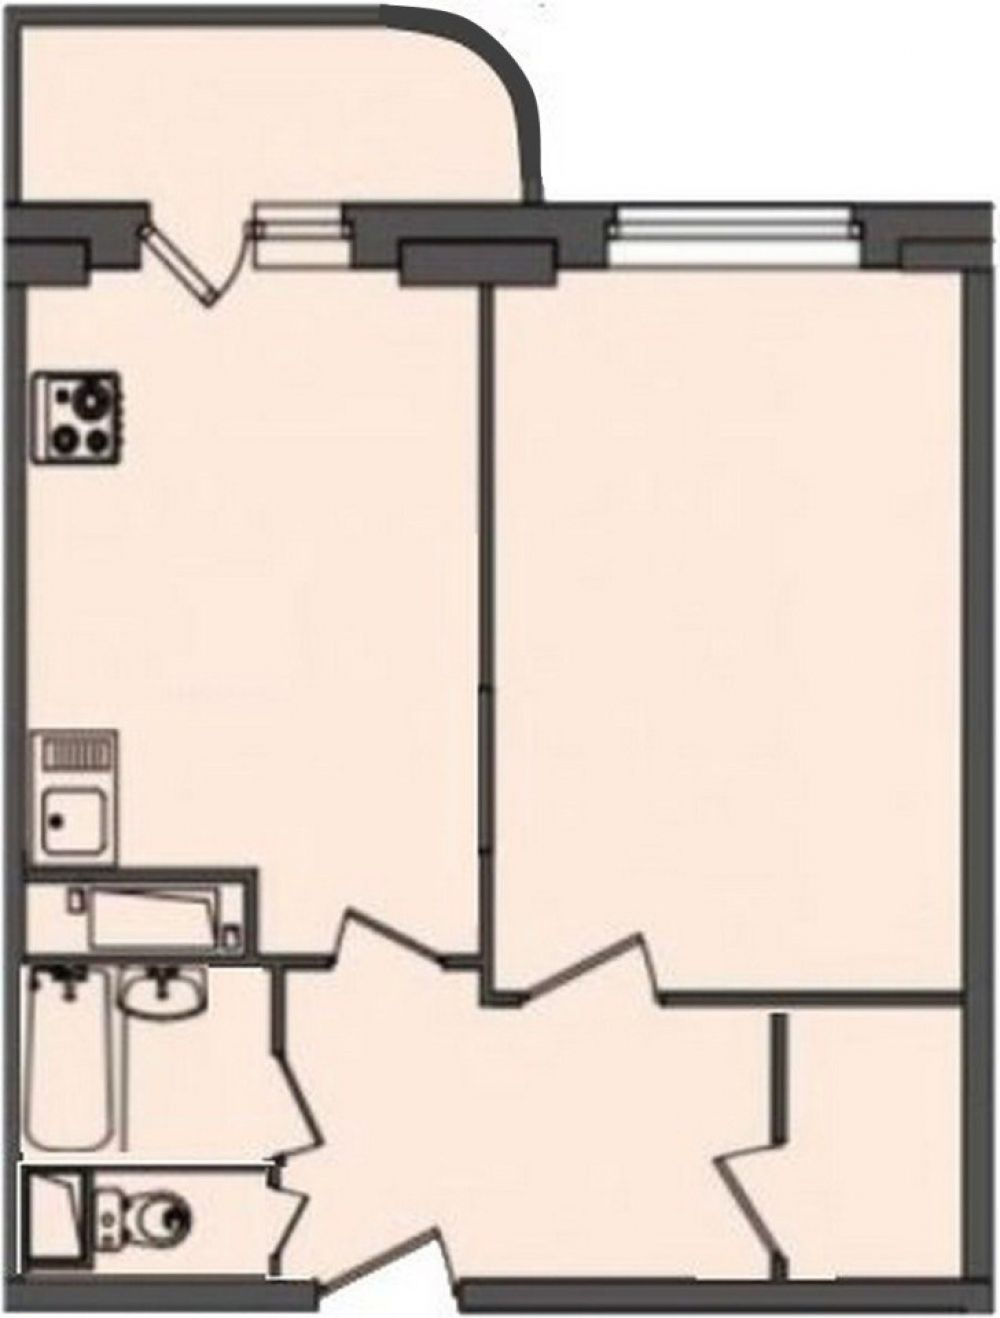 1-комнатная квартира 47.6 м2, г. Щелково, Богородский мкр,10, фото 1